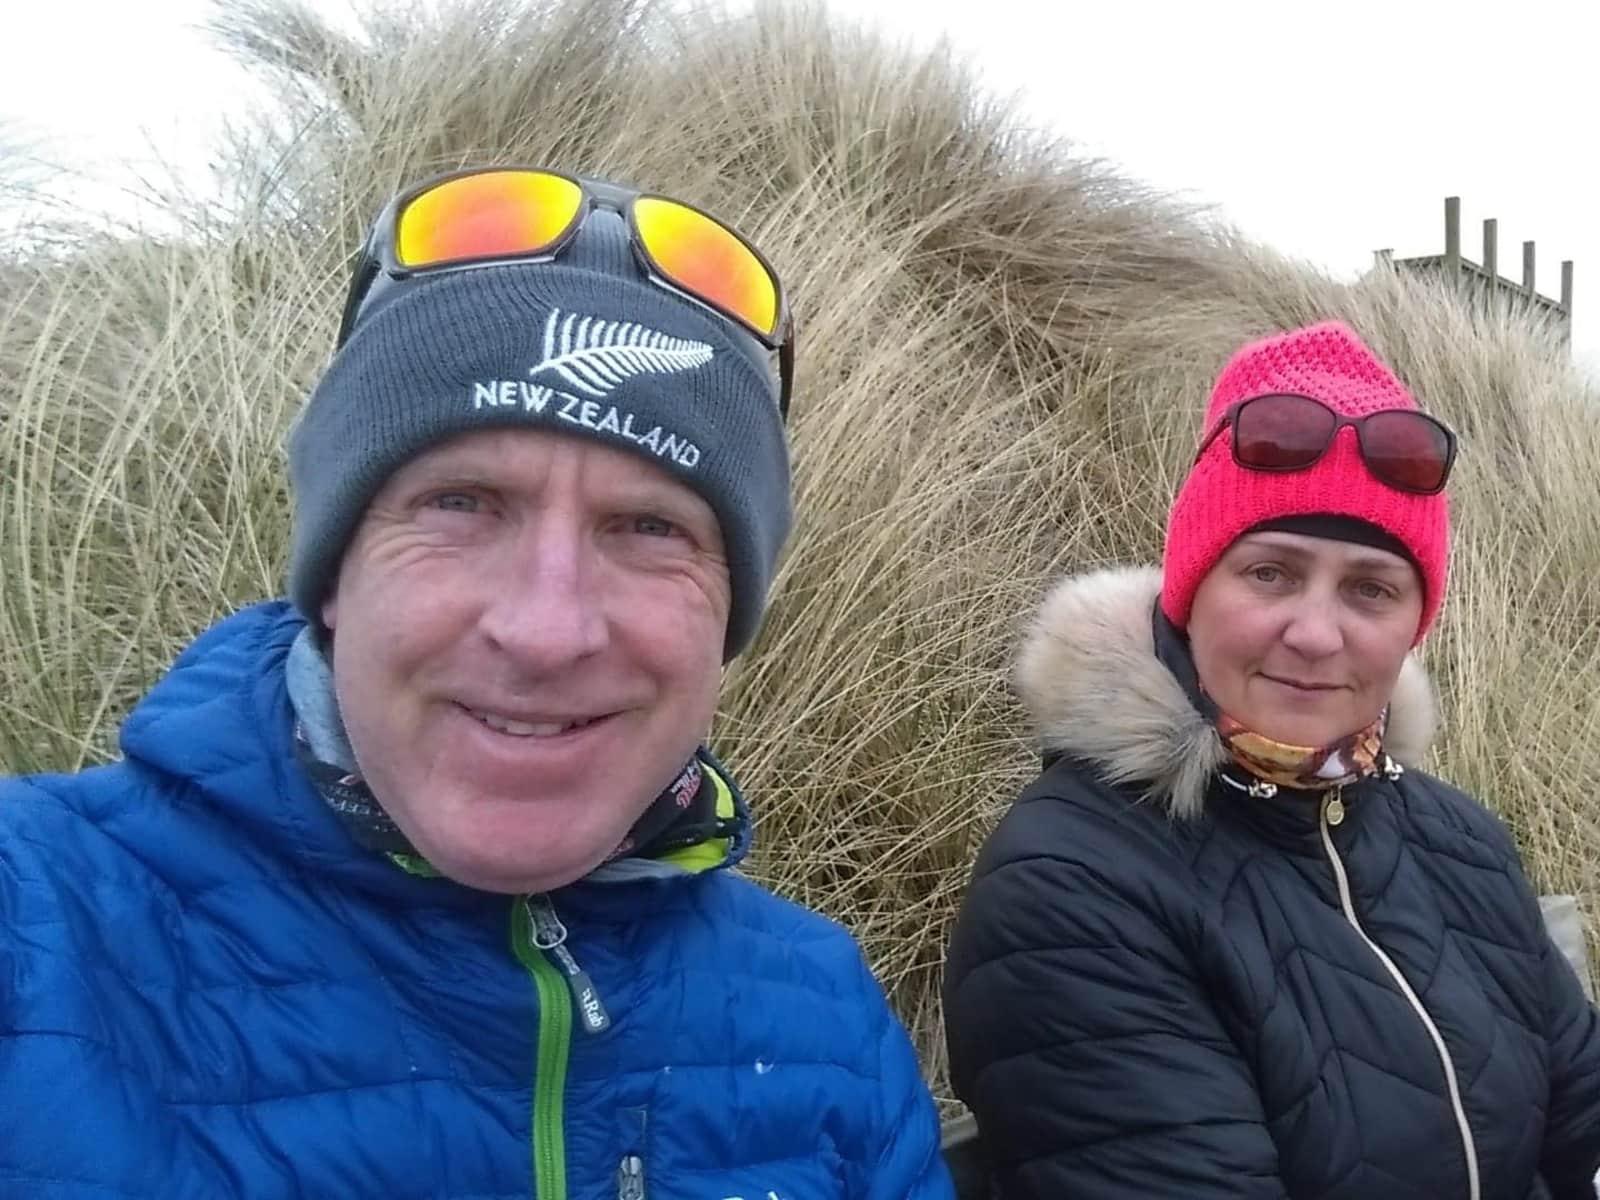 Jolinda & Mark from Ballasalla, Isle of Man